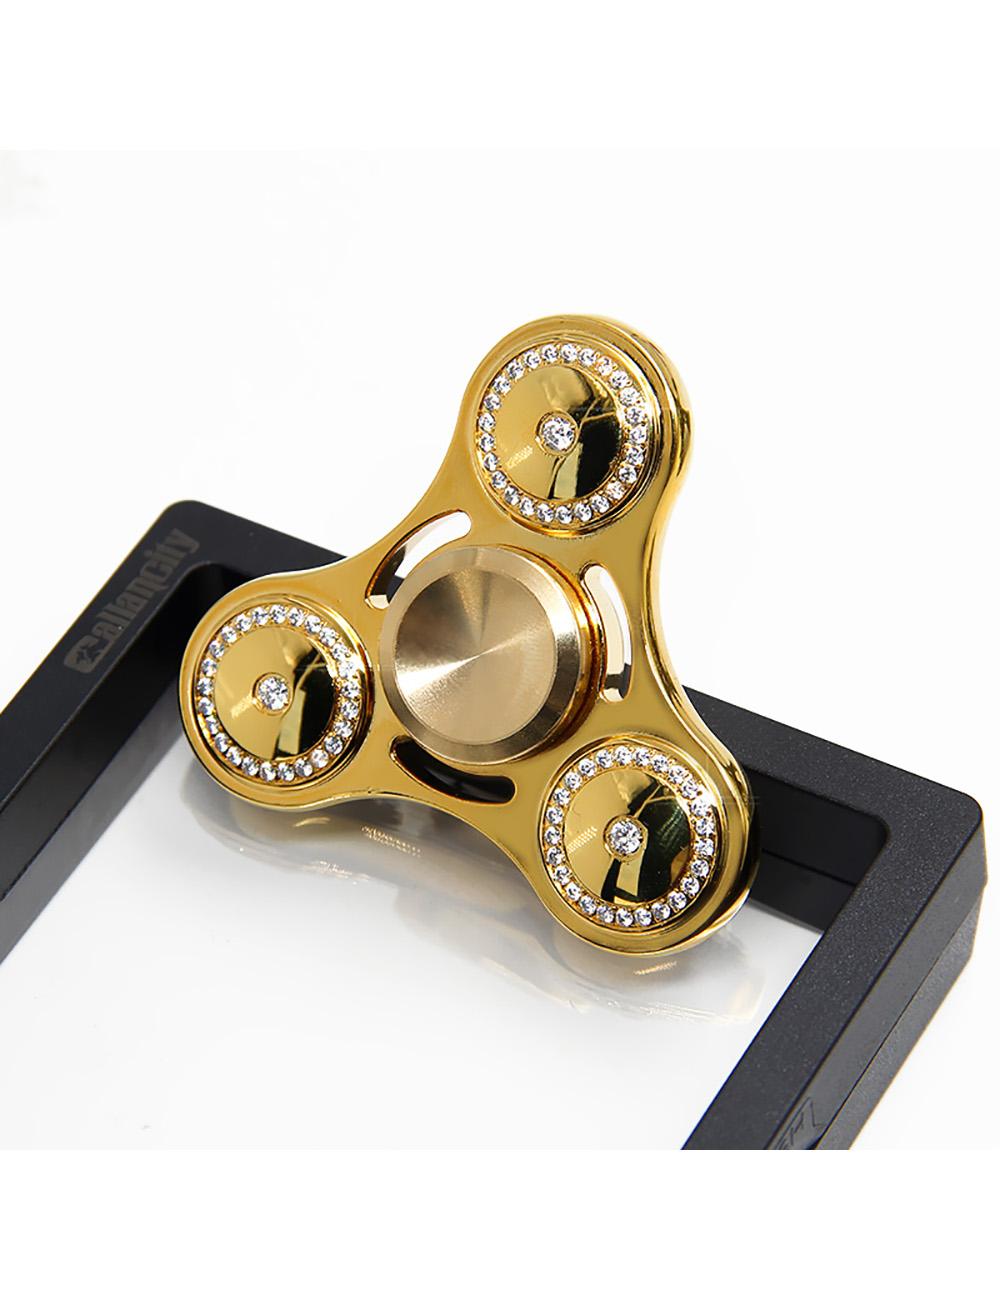 Luxury 24kt Gold Plated Brass Fidget Spinner With Diamonds